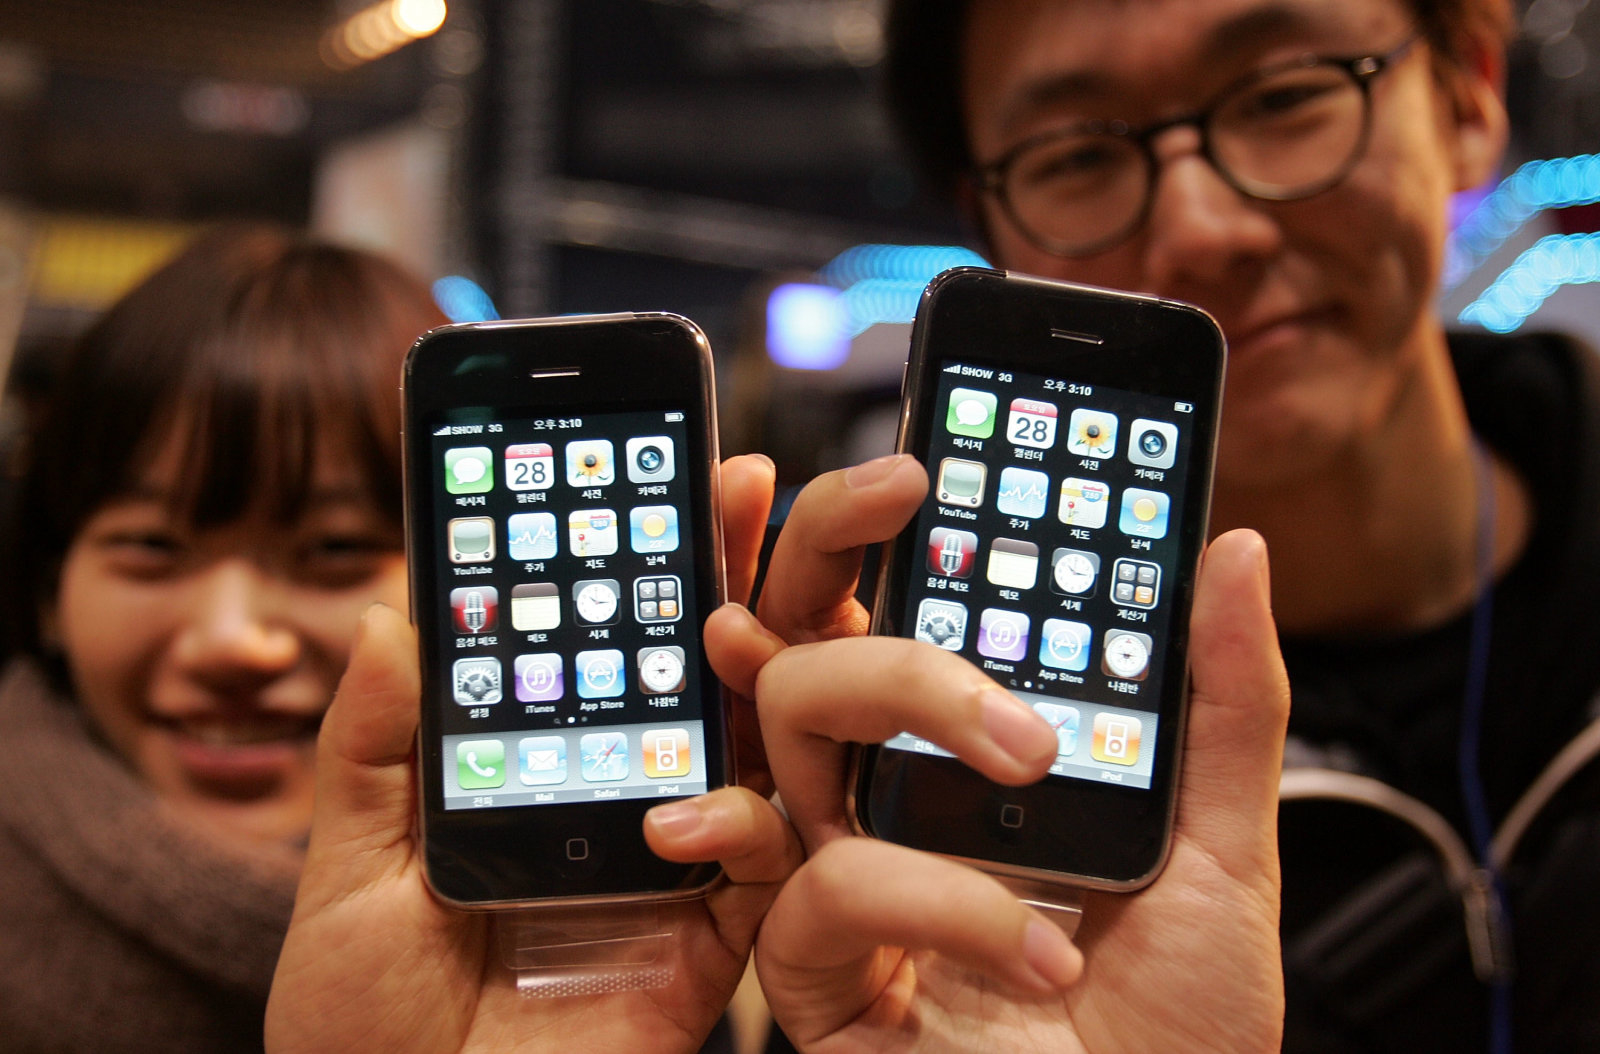 iphone dưới 1 triệu